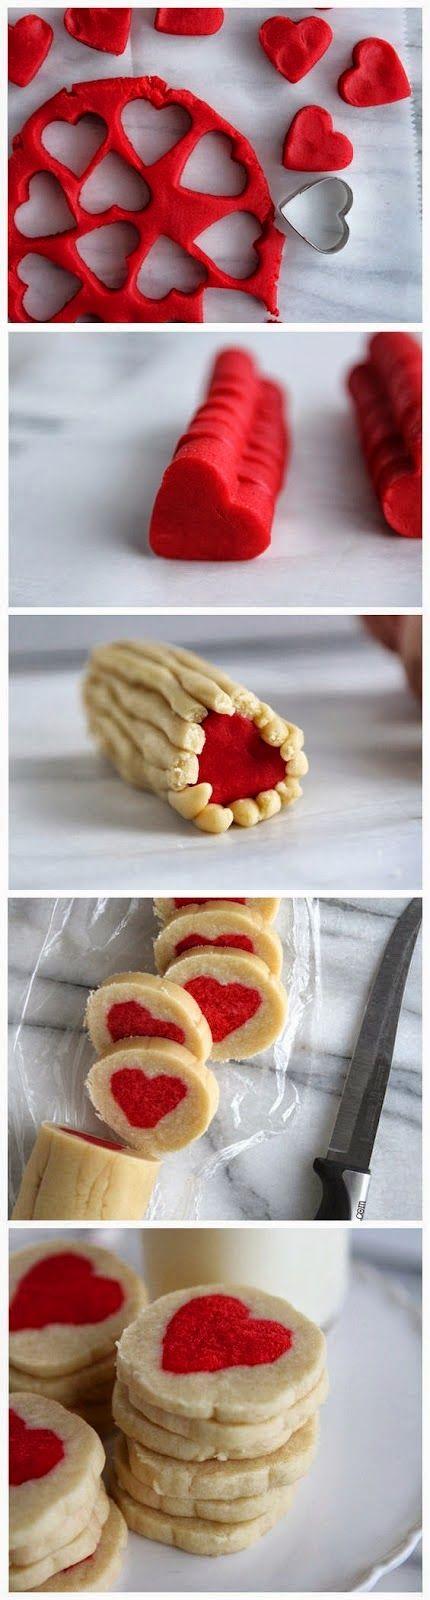 Slice n' Bake Valentine Heart Cookies, More info: http://www.cookie-elf.com/refrigerator-cookies.html#sthash.cwdJ1fYL.dpbs